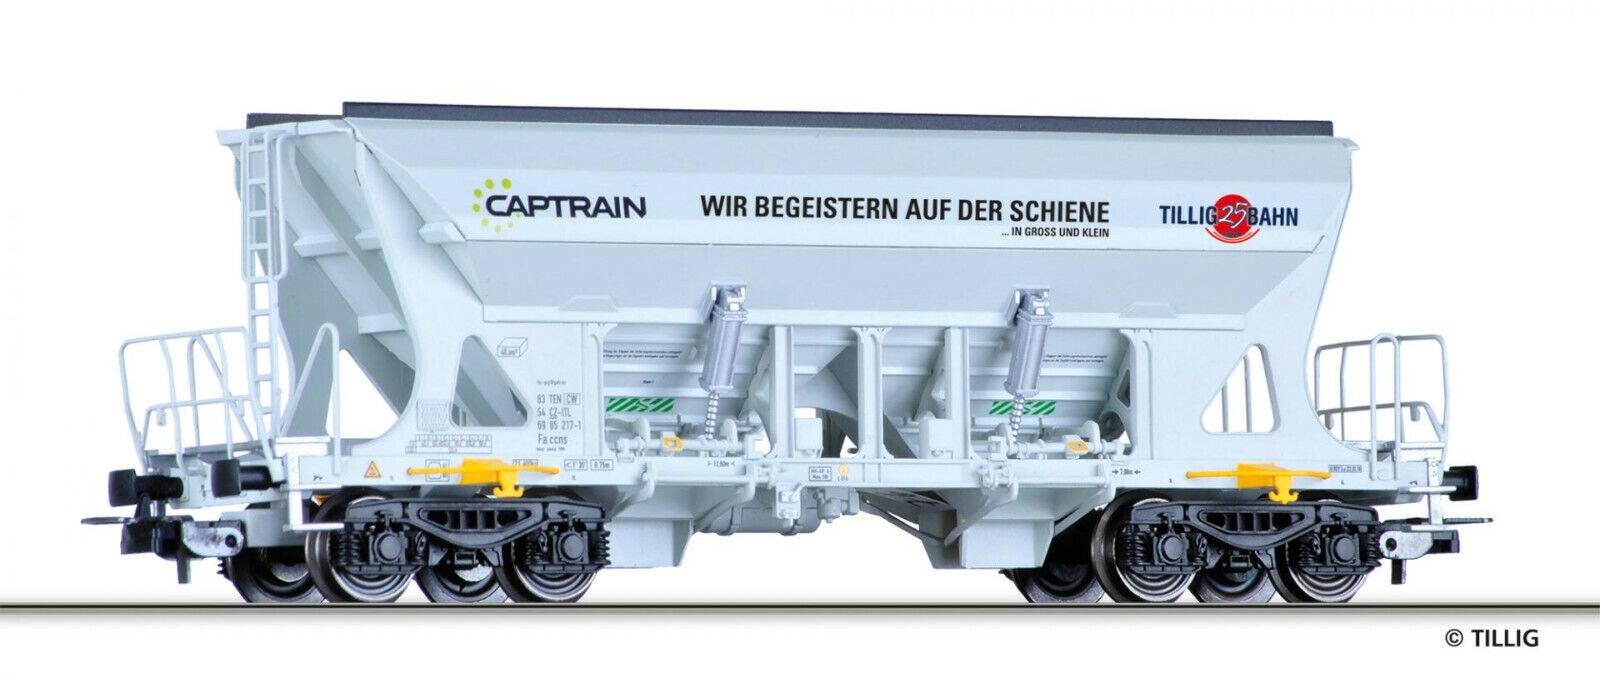 Tillig 501879 Selbstentladewagen Faccns der ITL (Captrain), Ep.VI NEU OVP